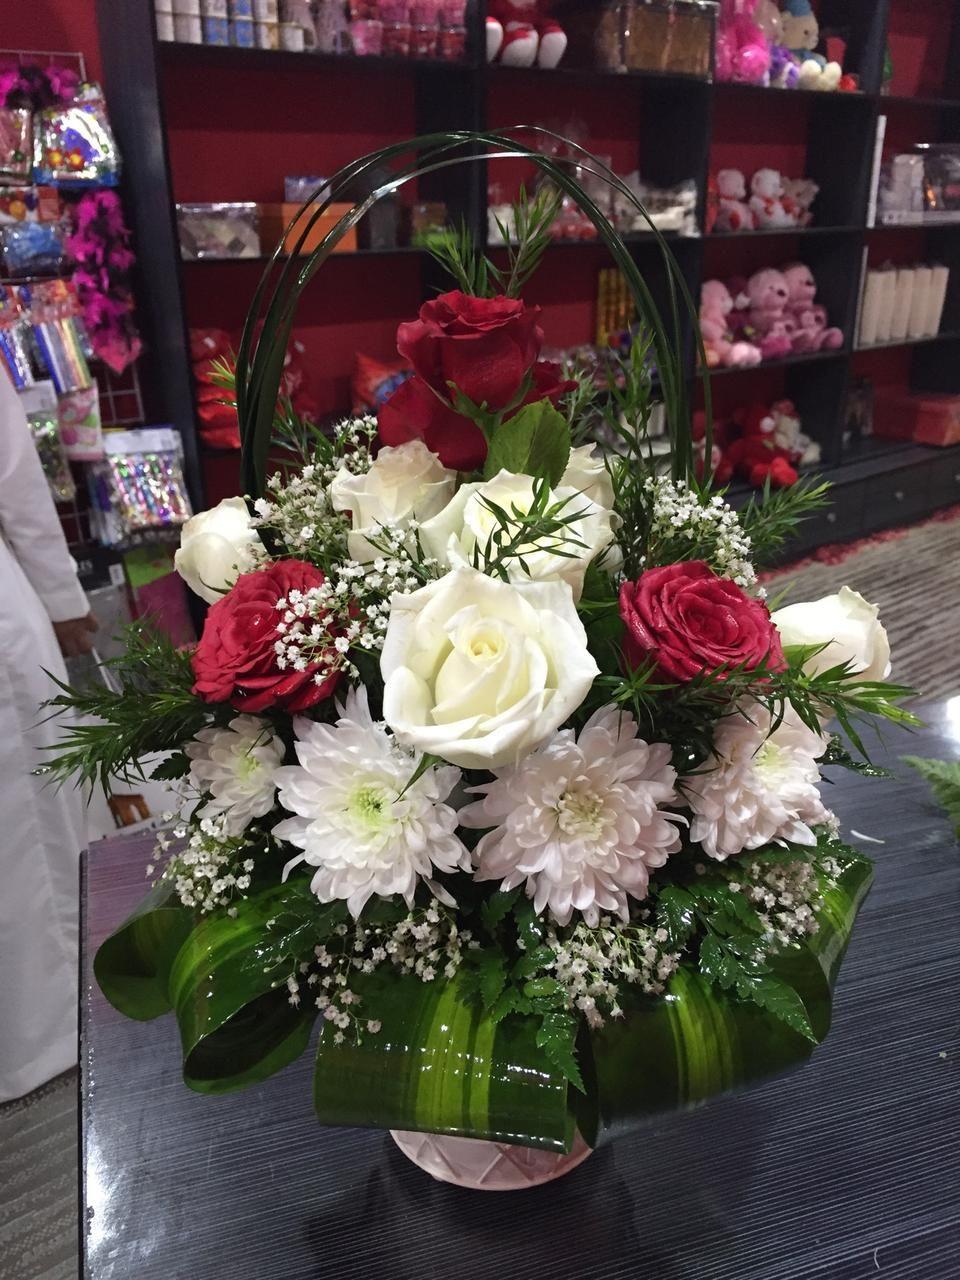 ورد الشوق Flower Shop Floral Wreath Table Decorations Decor